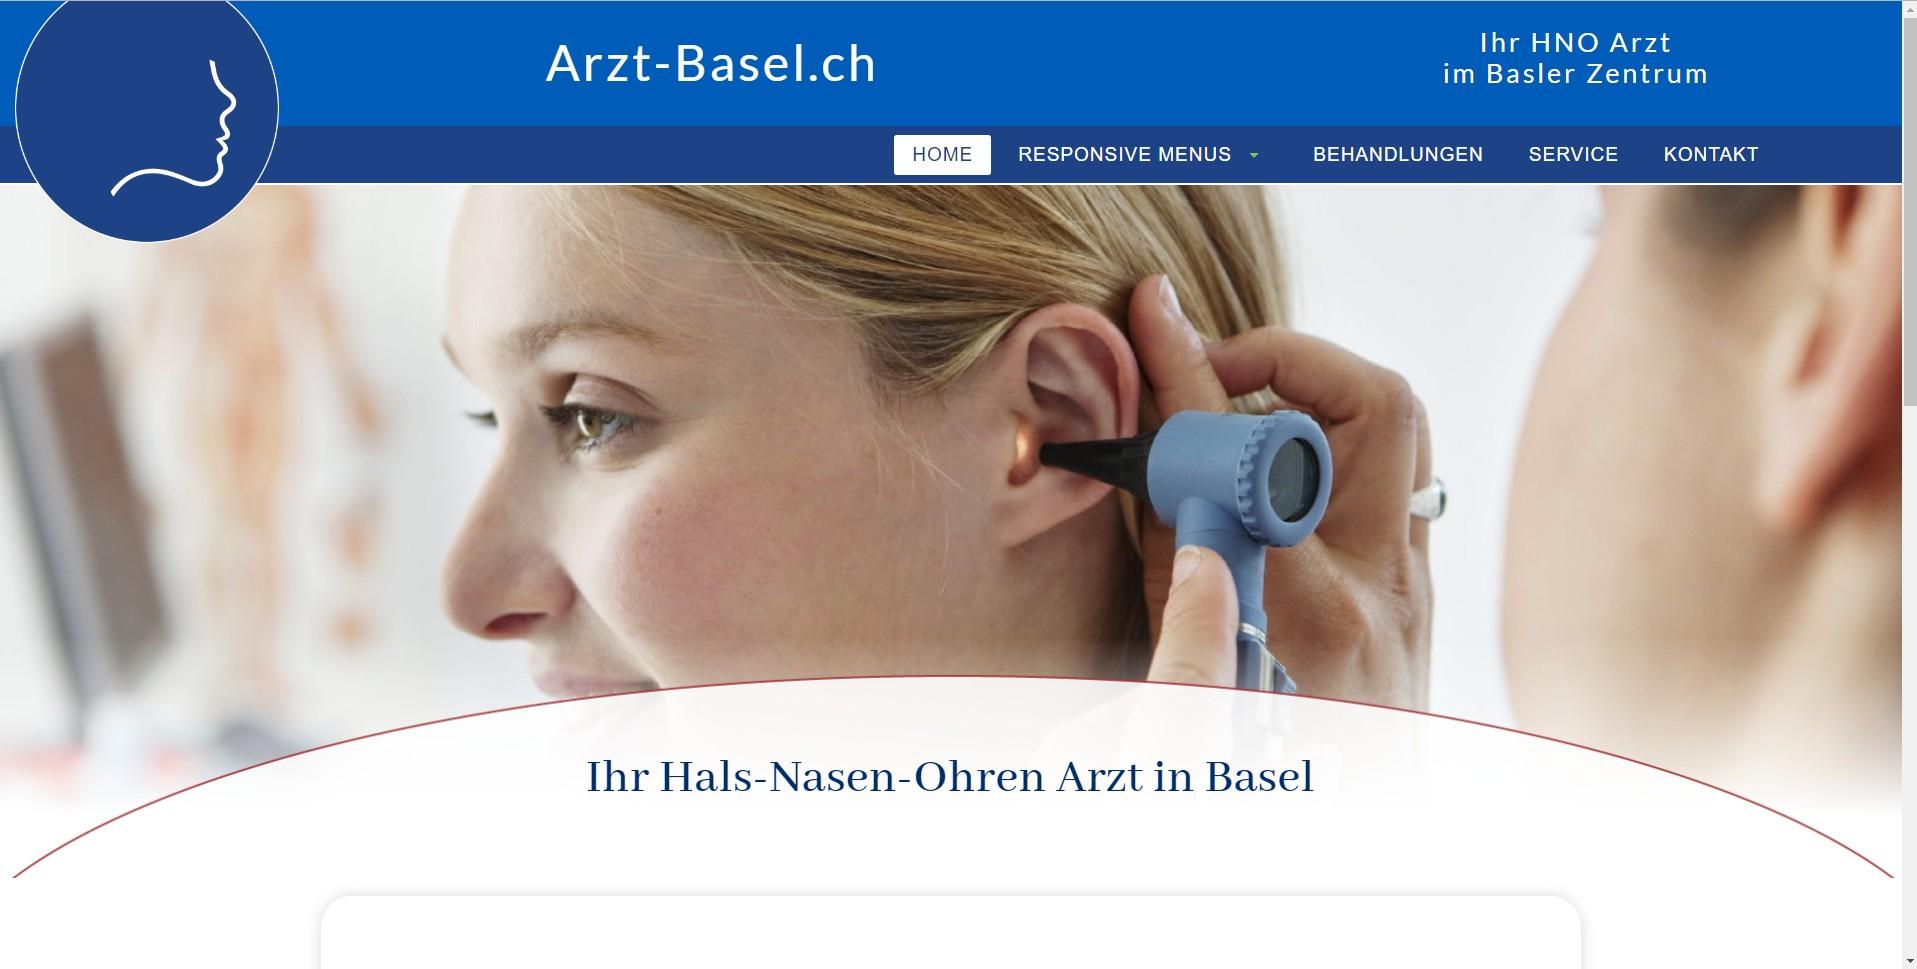 Arzt-Basel.ch